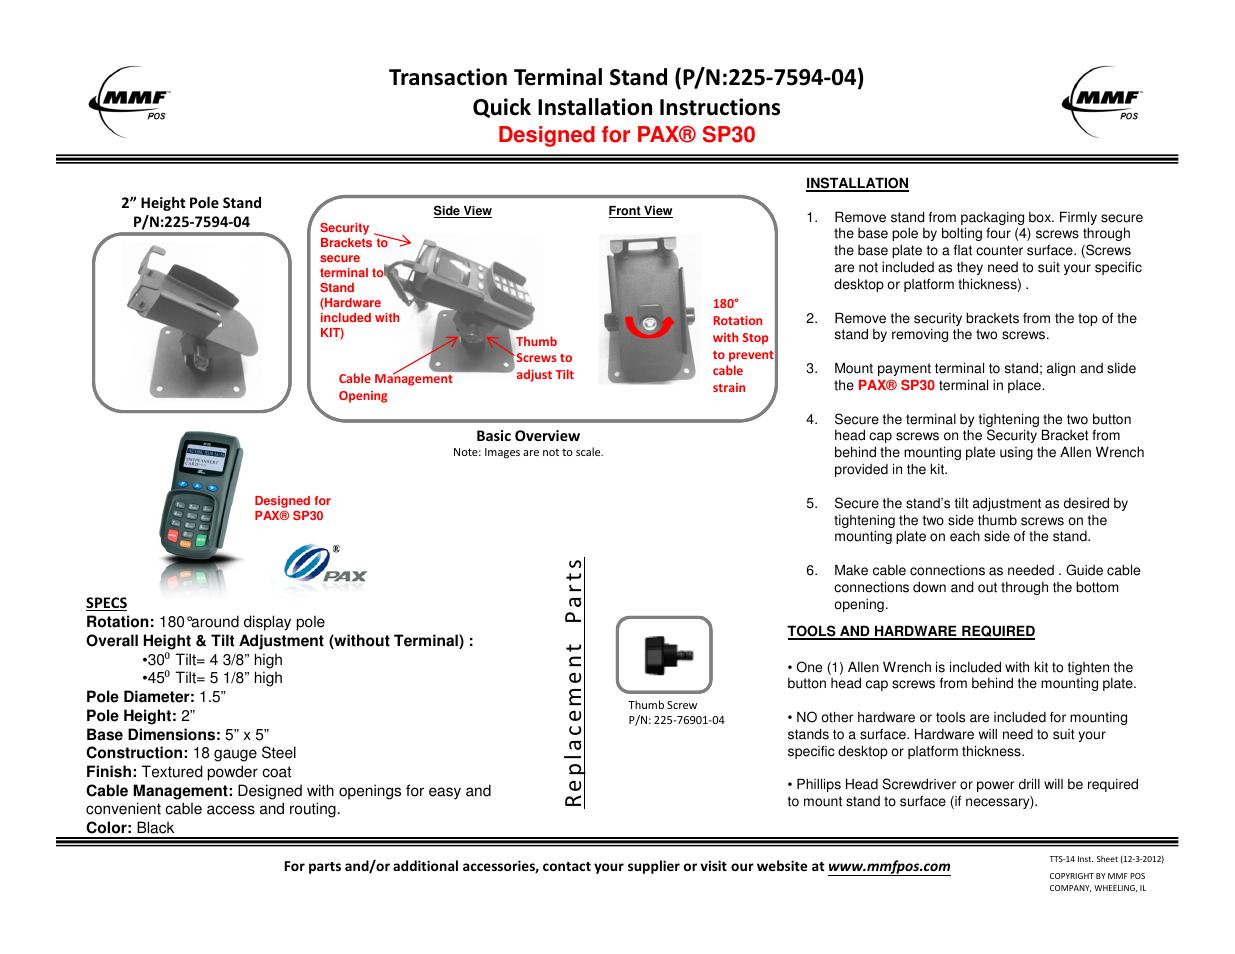 mmf pos pax sp30 transaction terminal stand user manual 1 page rh manualsdir com pax assembly manual pax era instruction manual